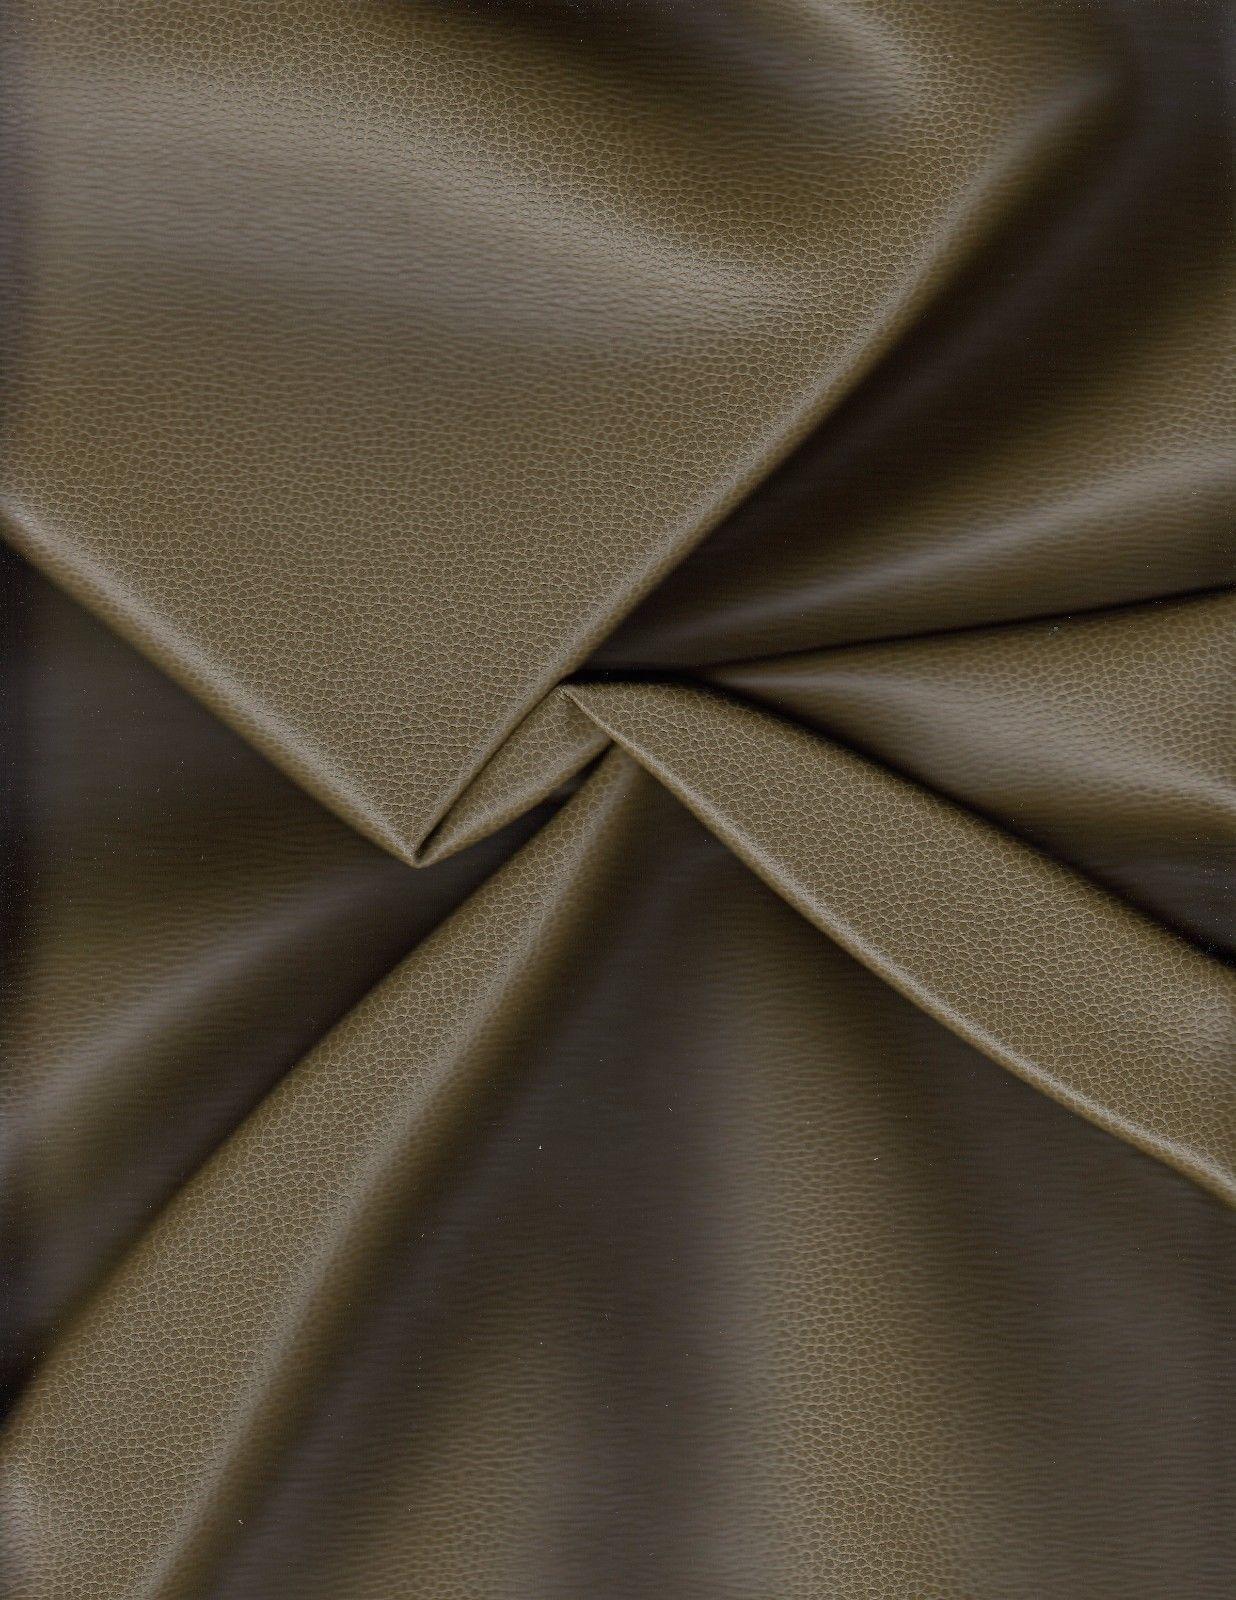 Ultrafabrics Tappezzeria Similpelle 363-4514 Promessa Verde Muschio 2.9m T-25